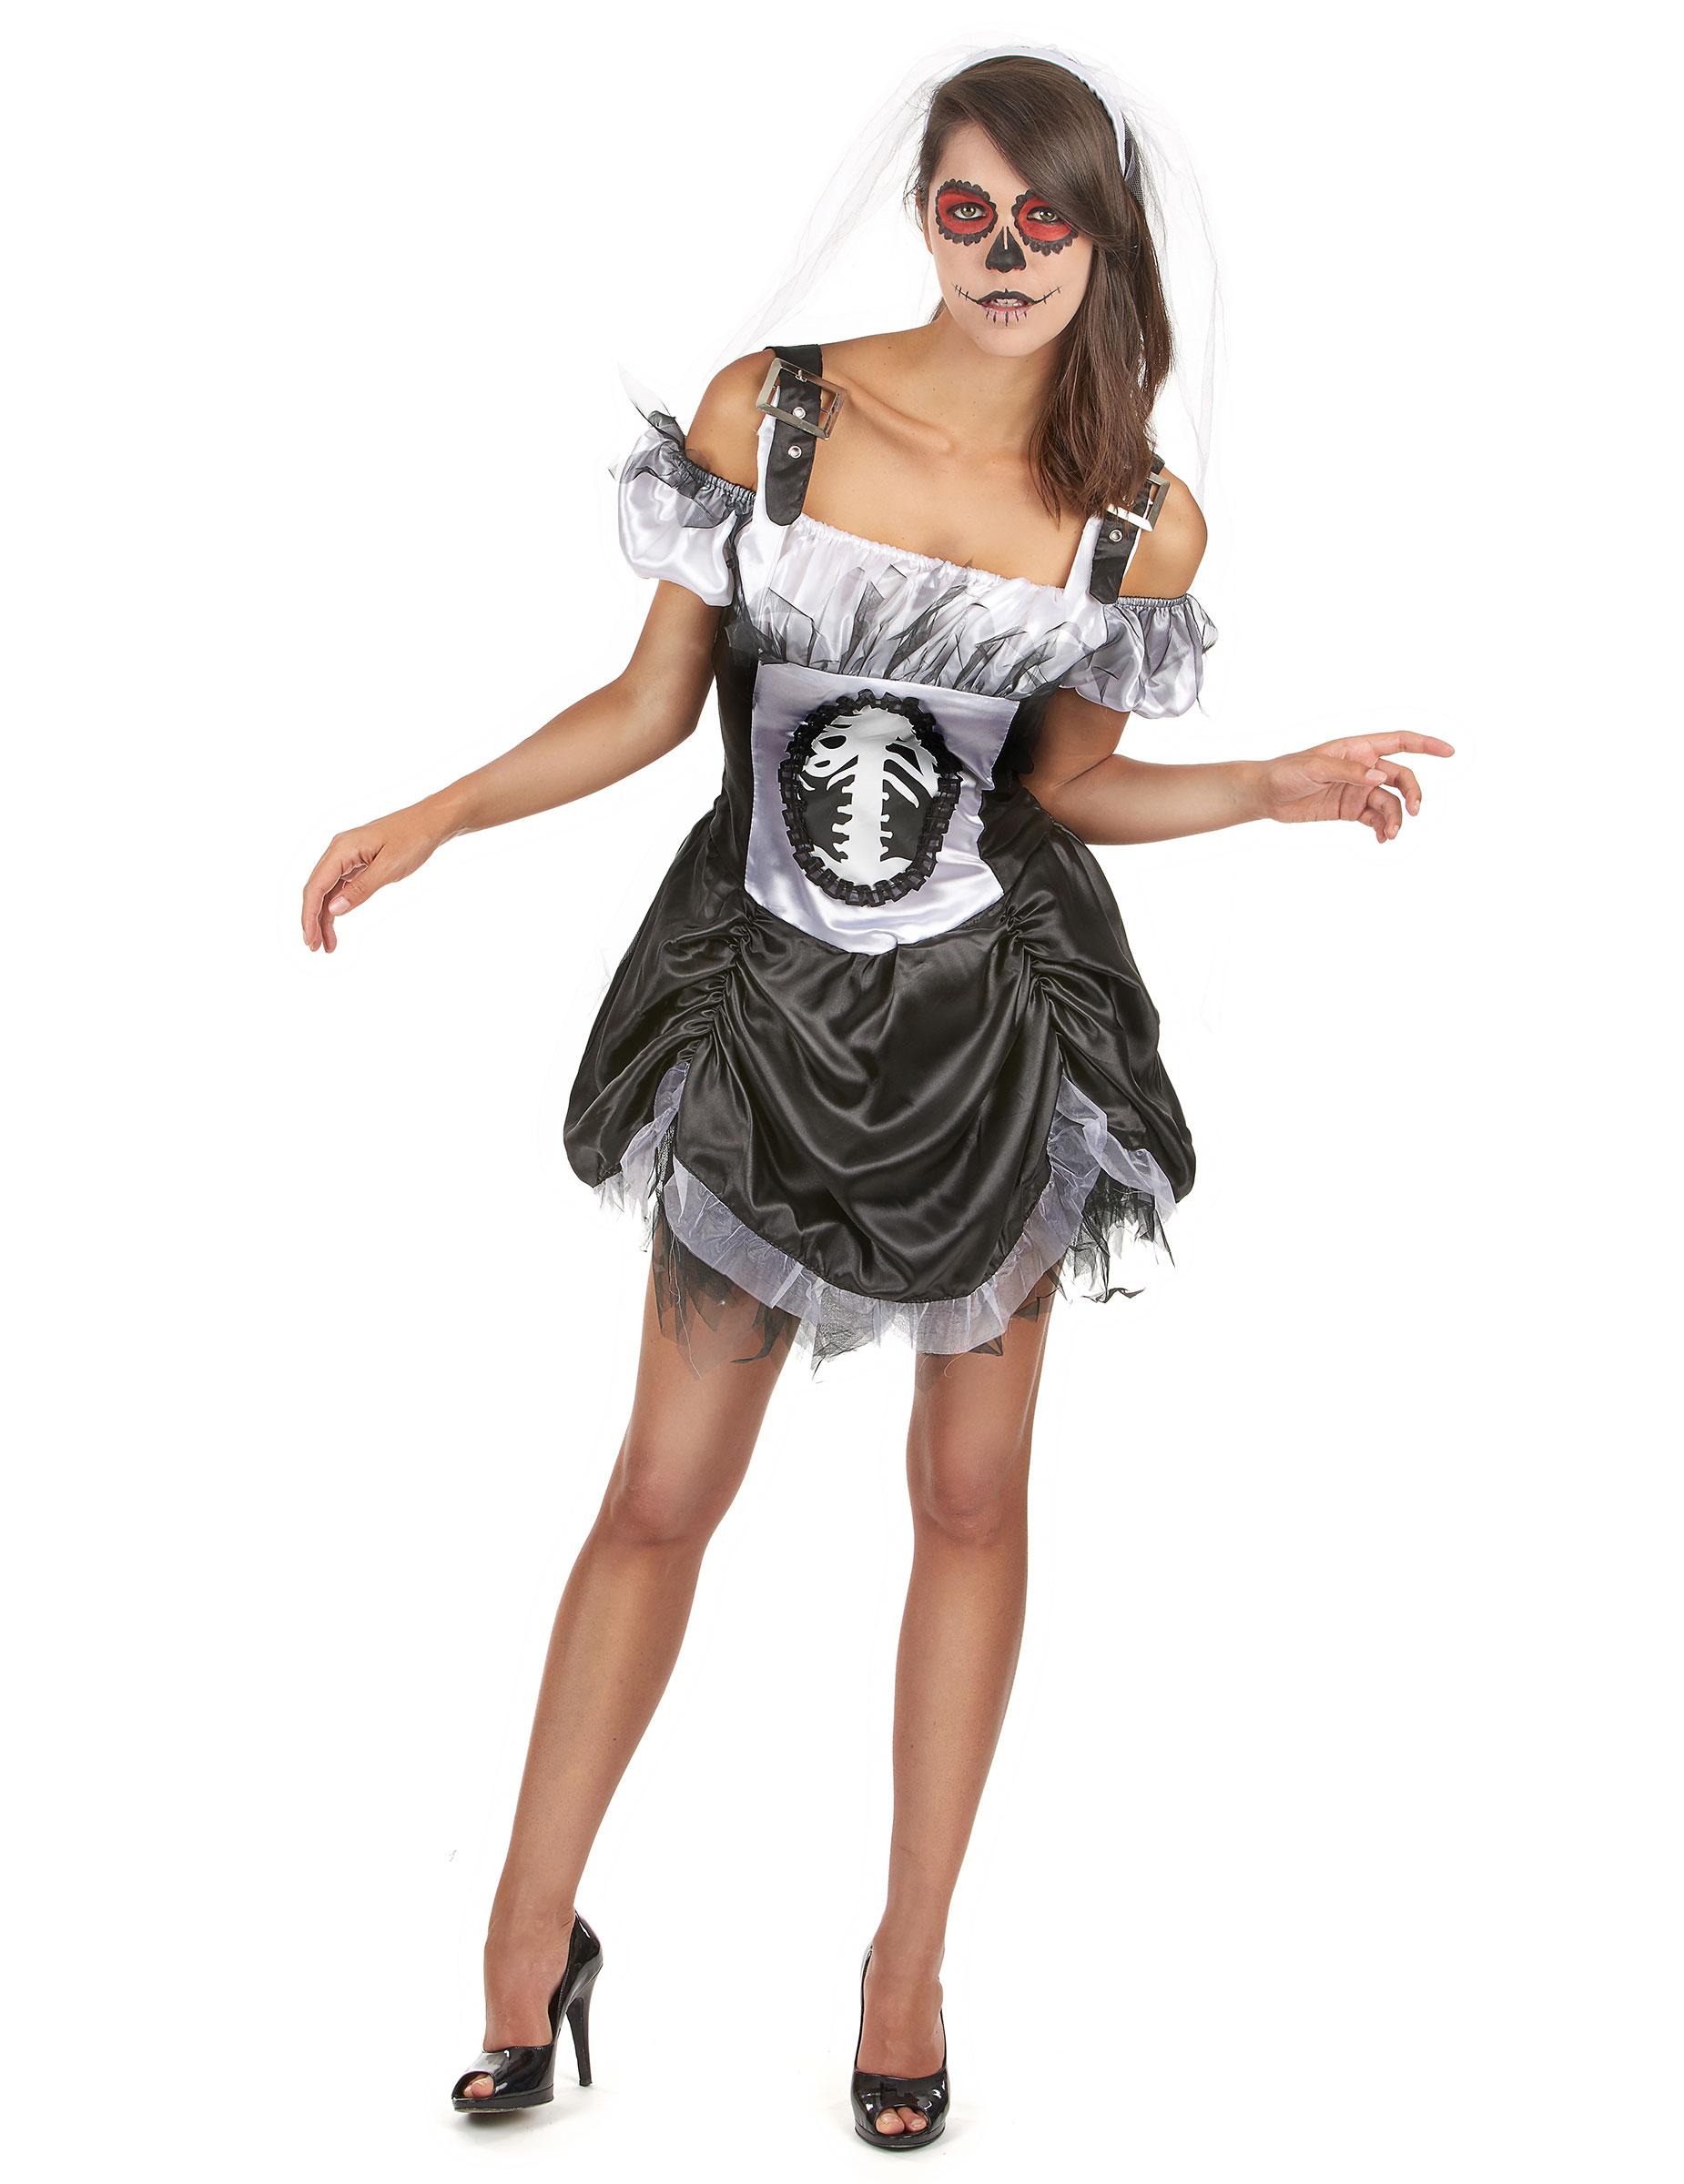 d guisement squelette chic femme halloween deguise toi. Black Bedroom Furniture Sets. Home Design Ideas